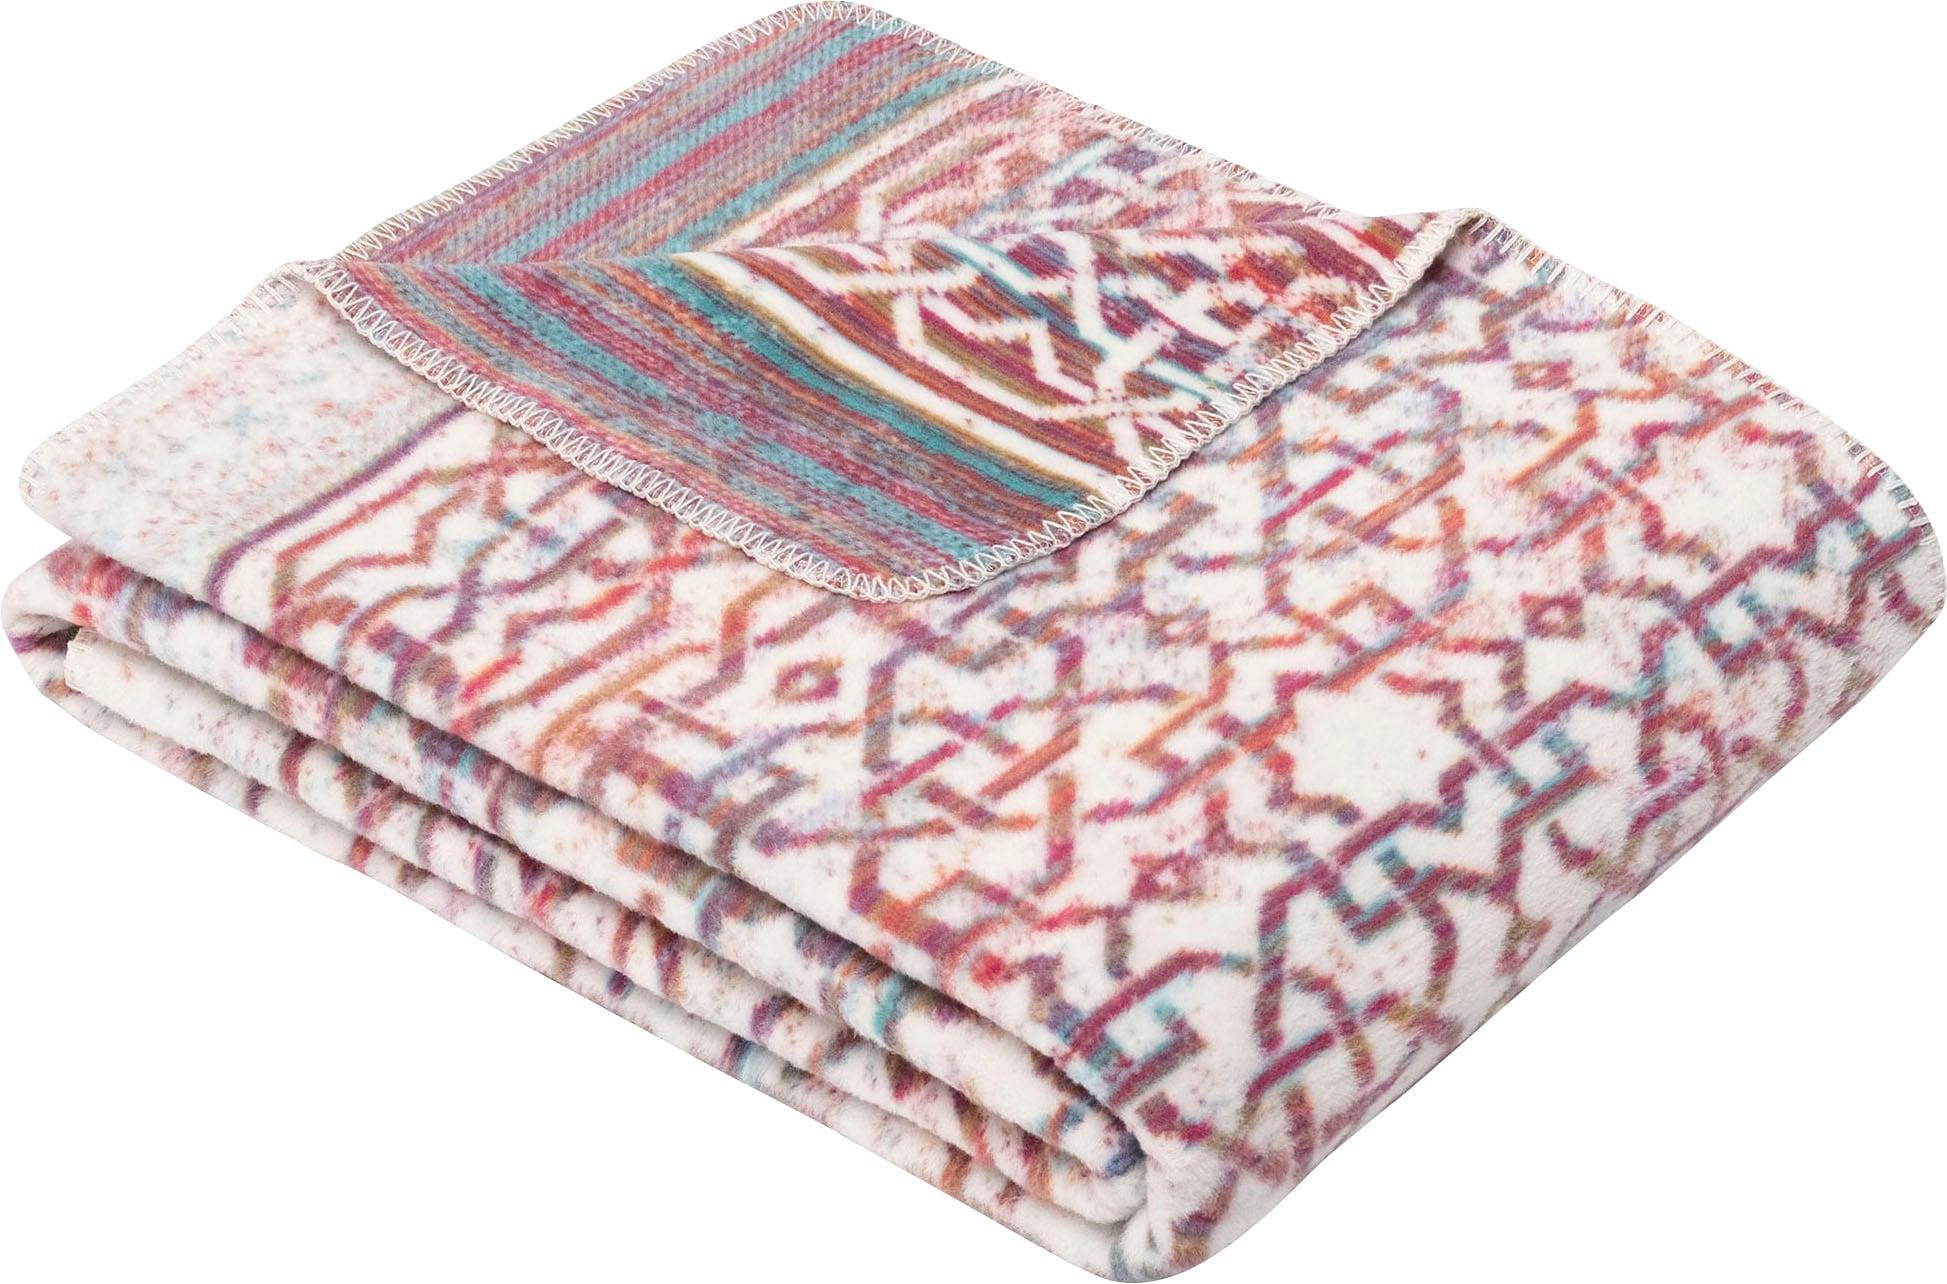 IBENA Wohndecke Punjab, mit marokkanischem Muster weiß Ibena